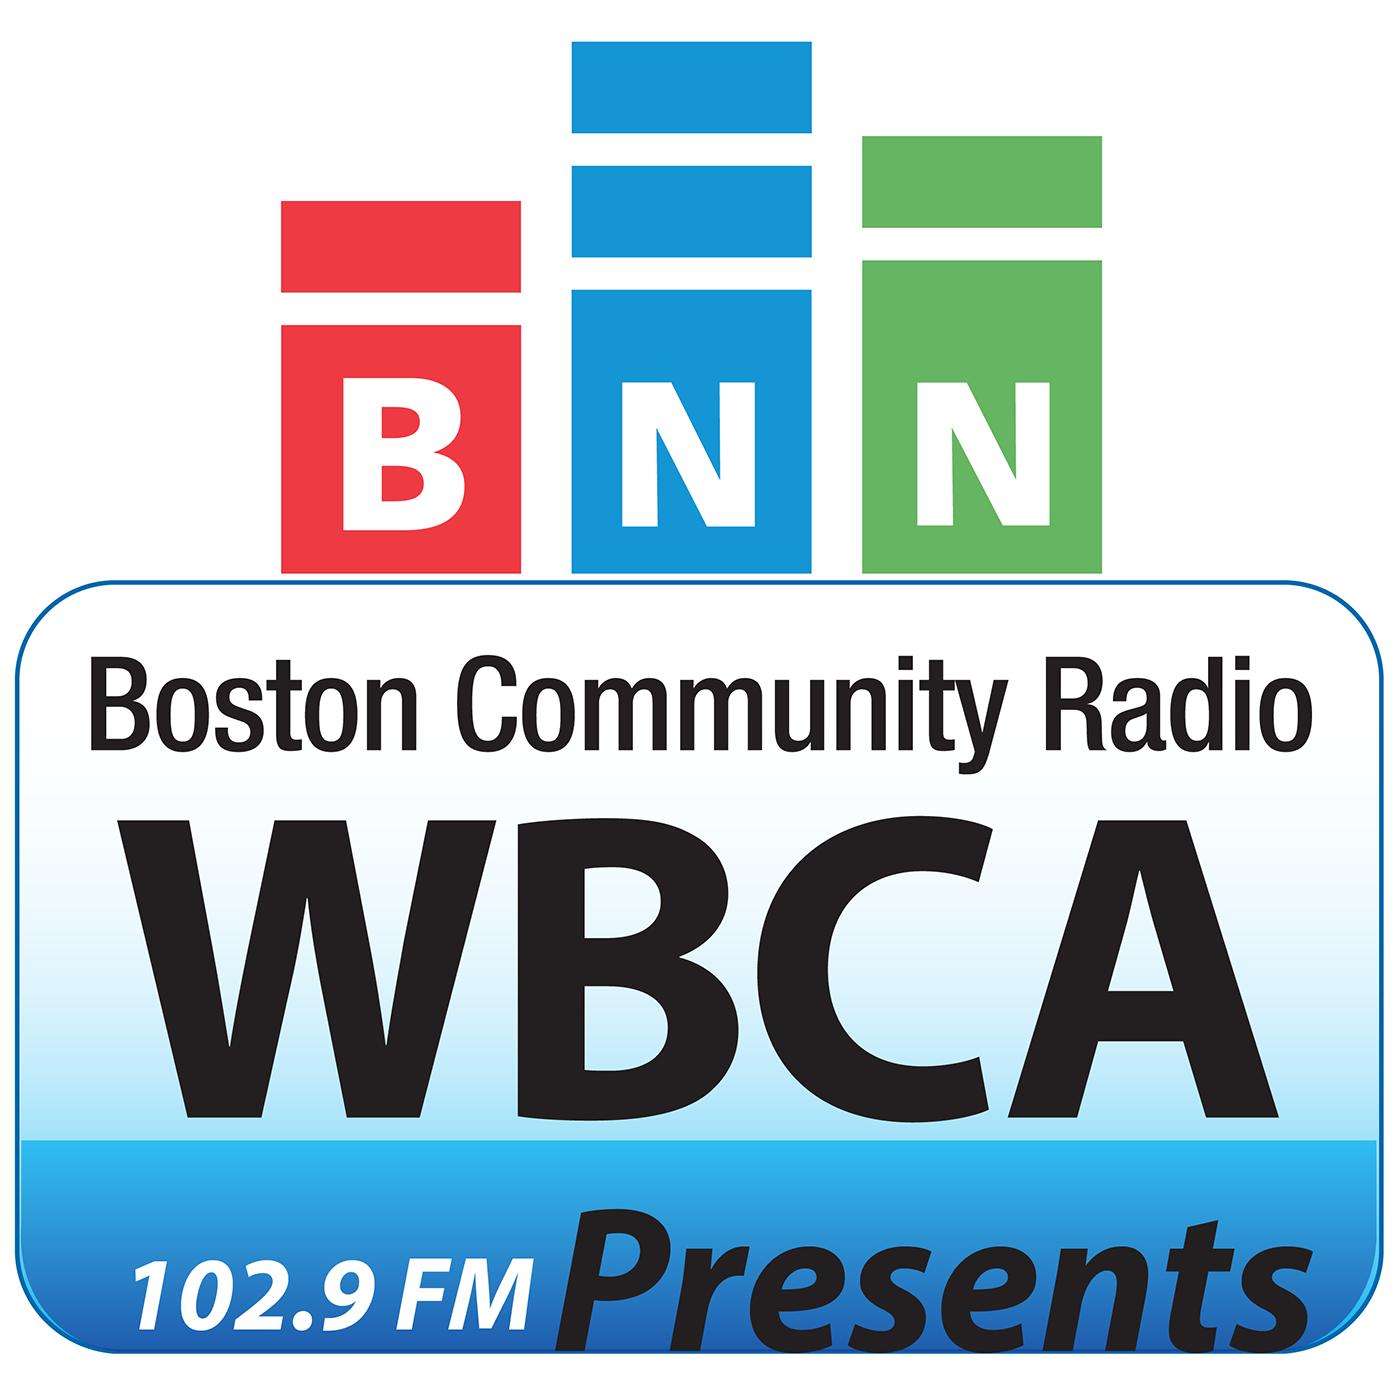 WBCA_Presents_Logo_1400x1400 (1).png